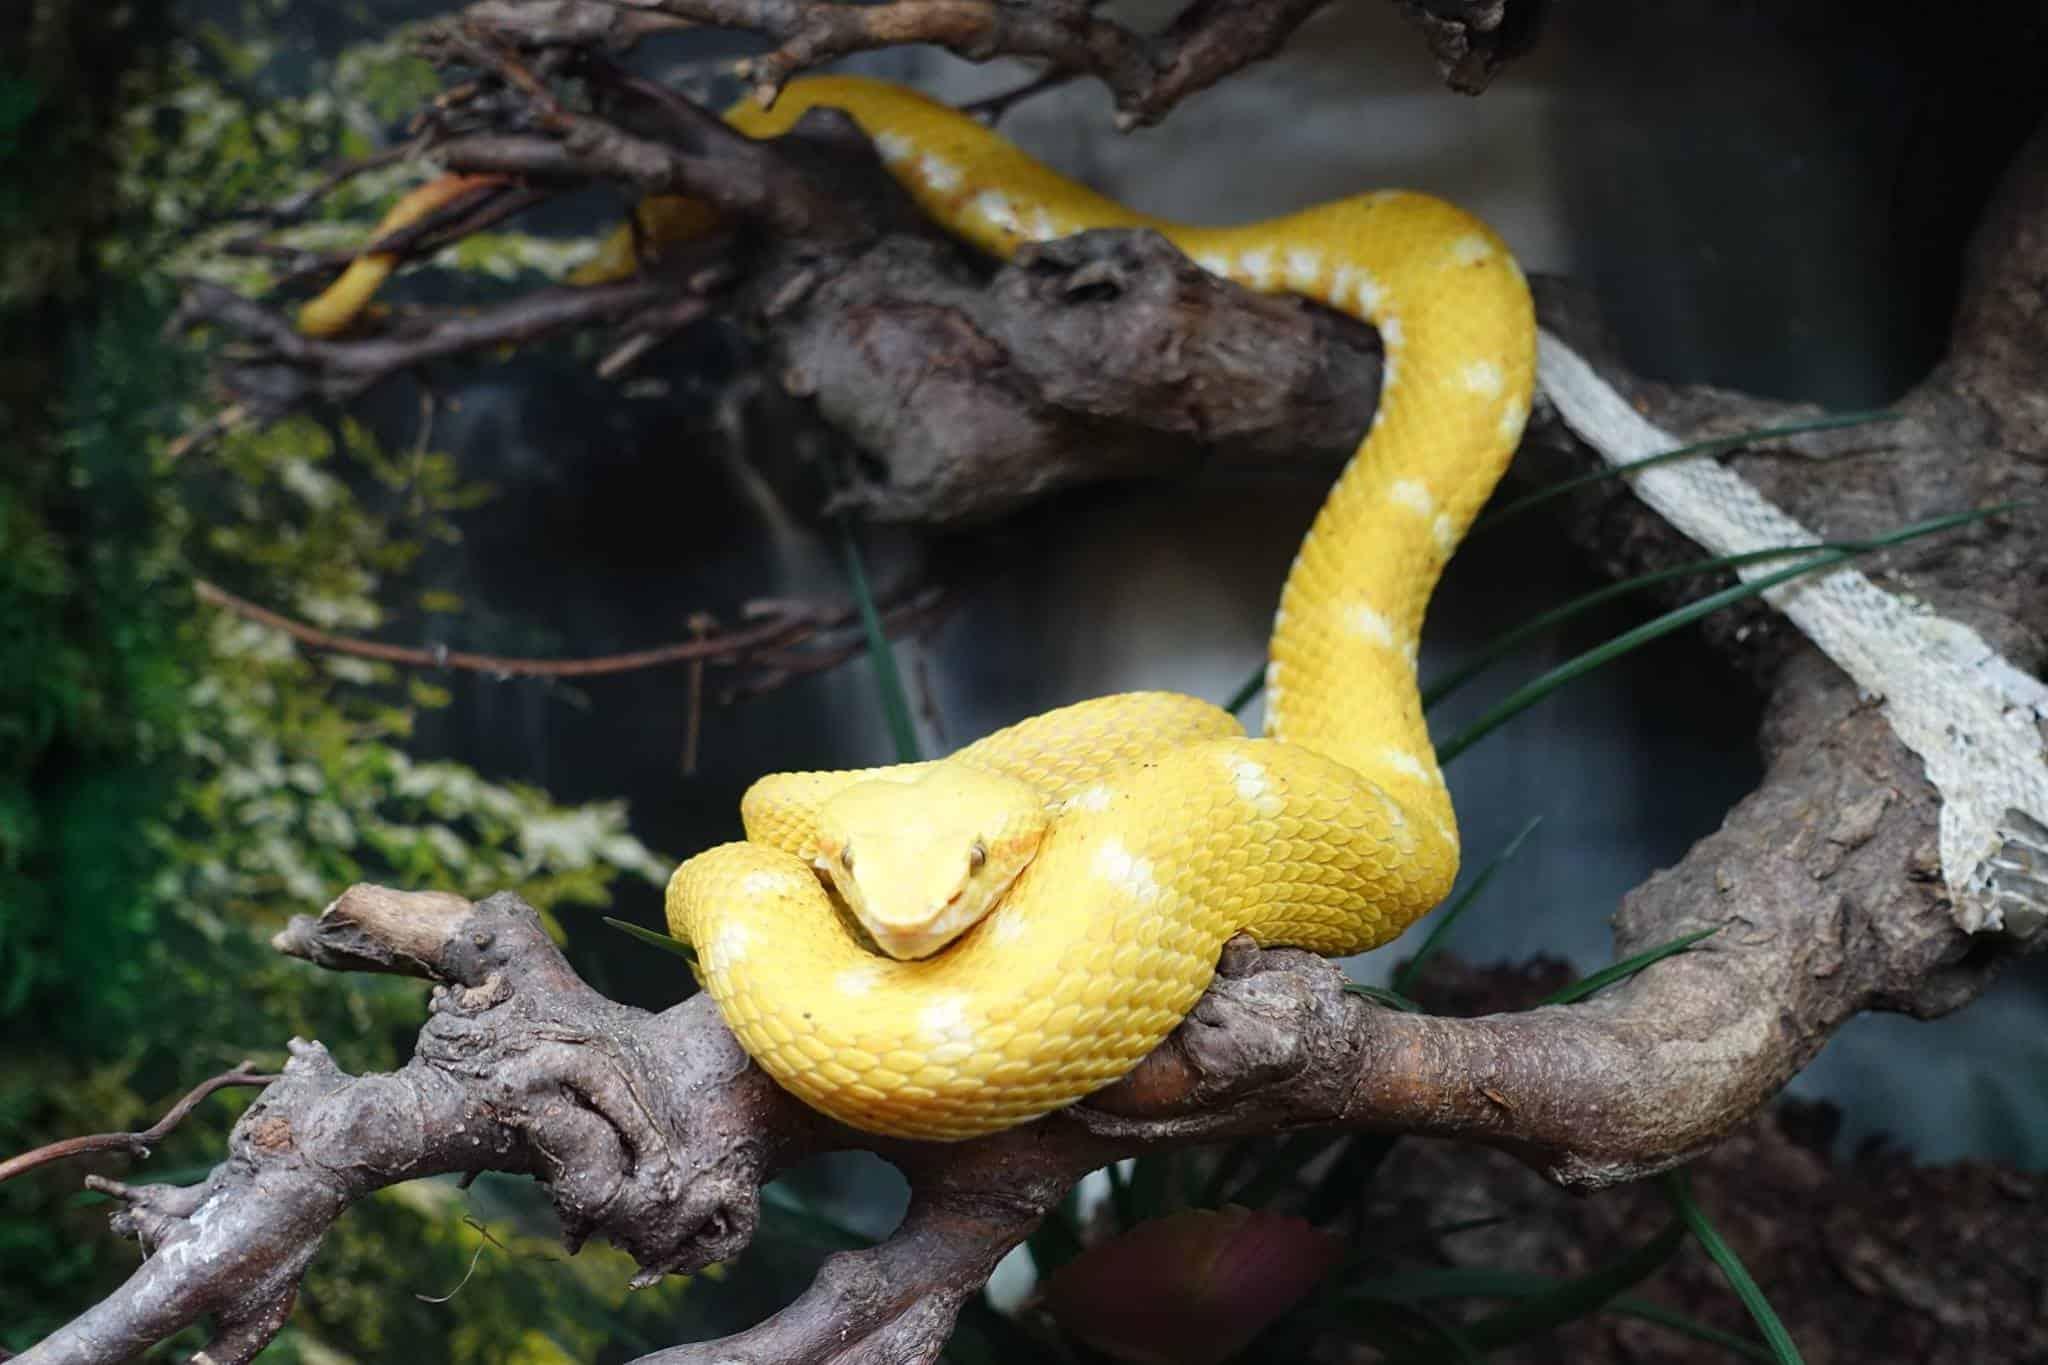 gelbe Schlange im Kärntner Ausflugsziel Reptilienzoo Happ in Klagenfurt am Wörthersee